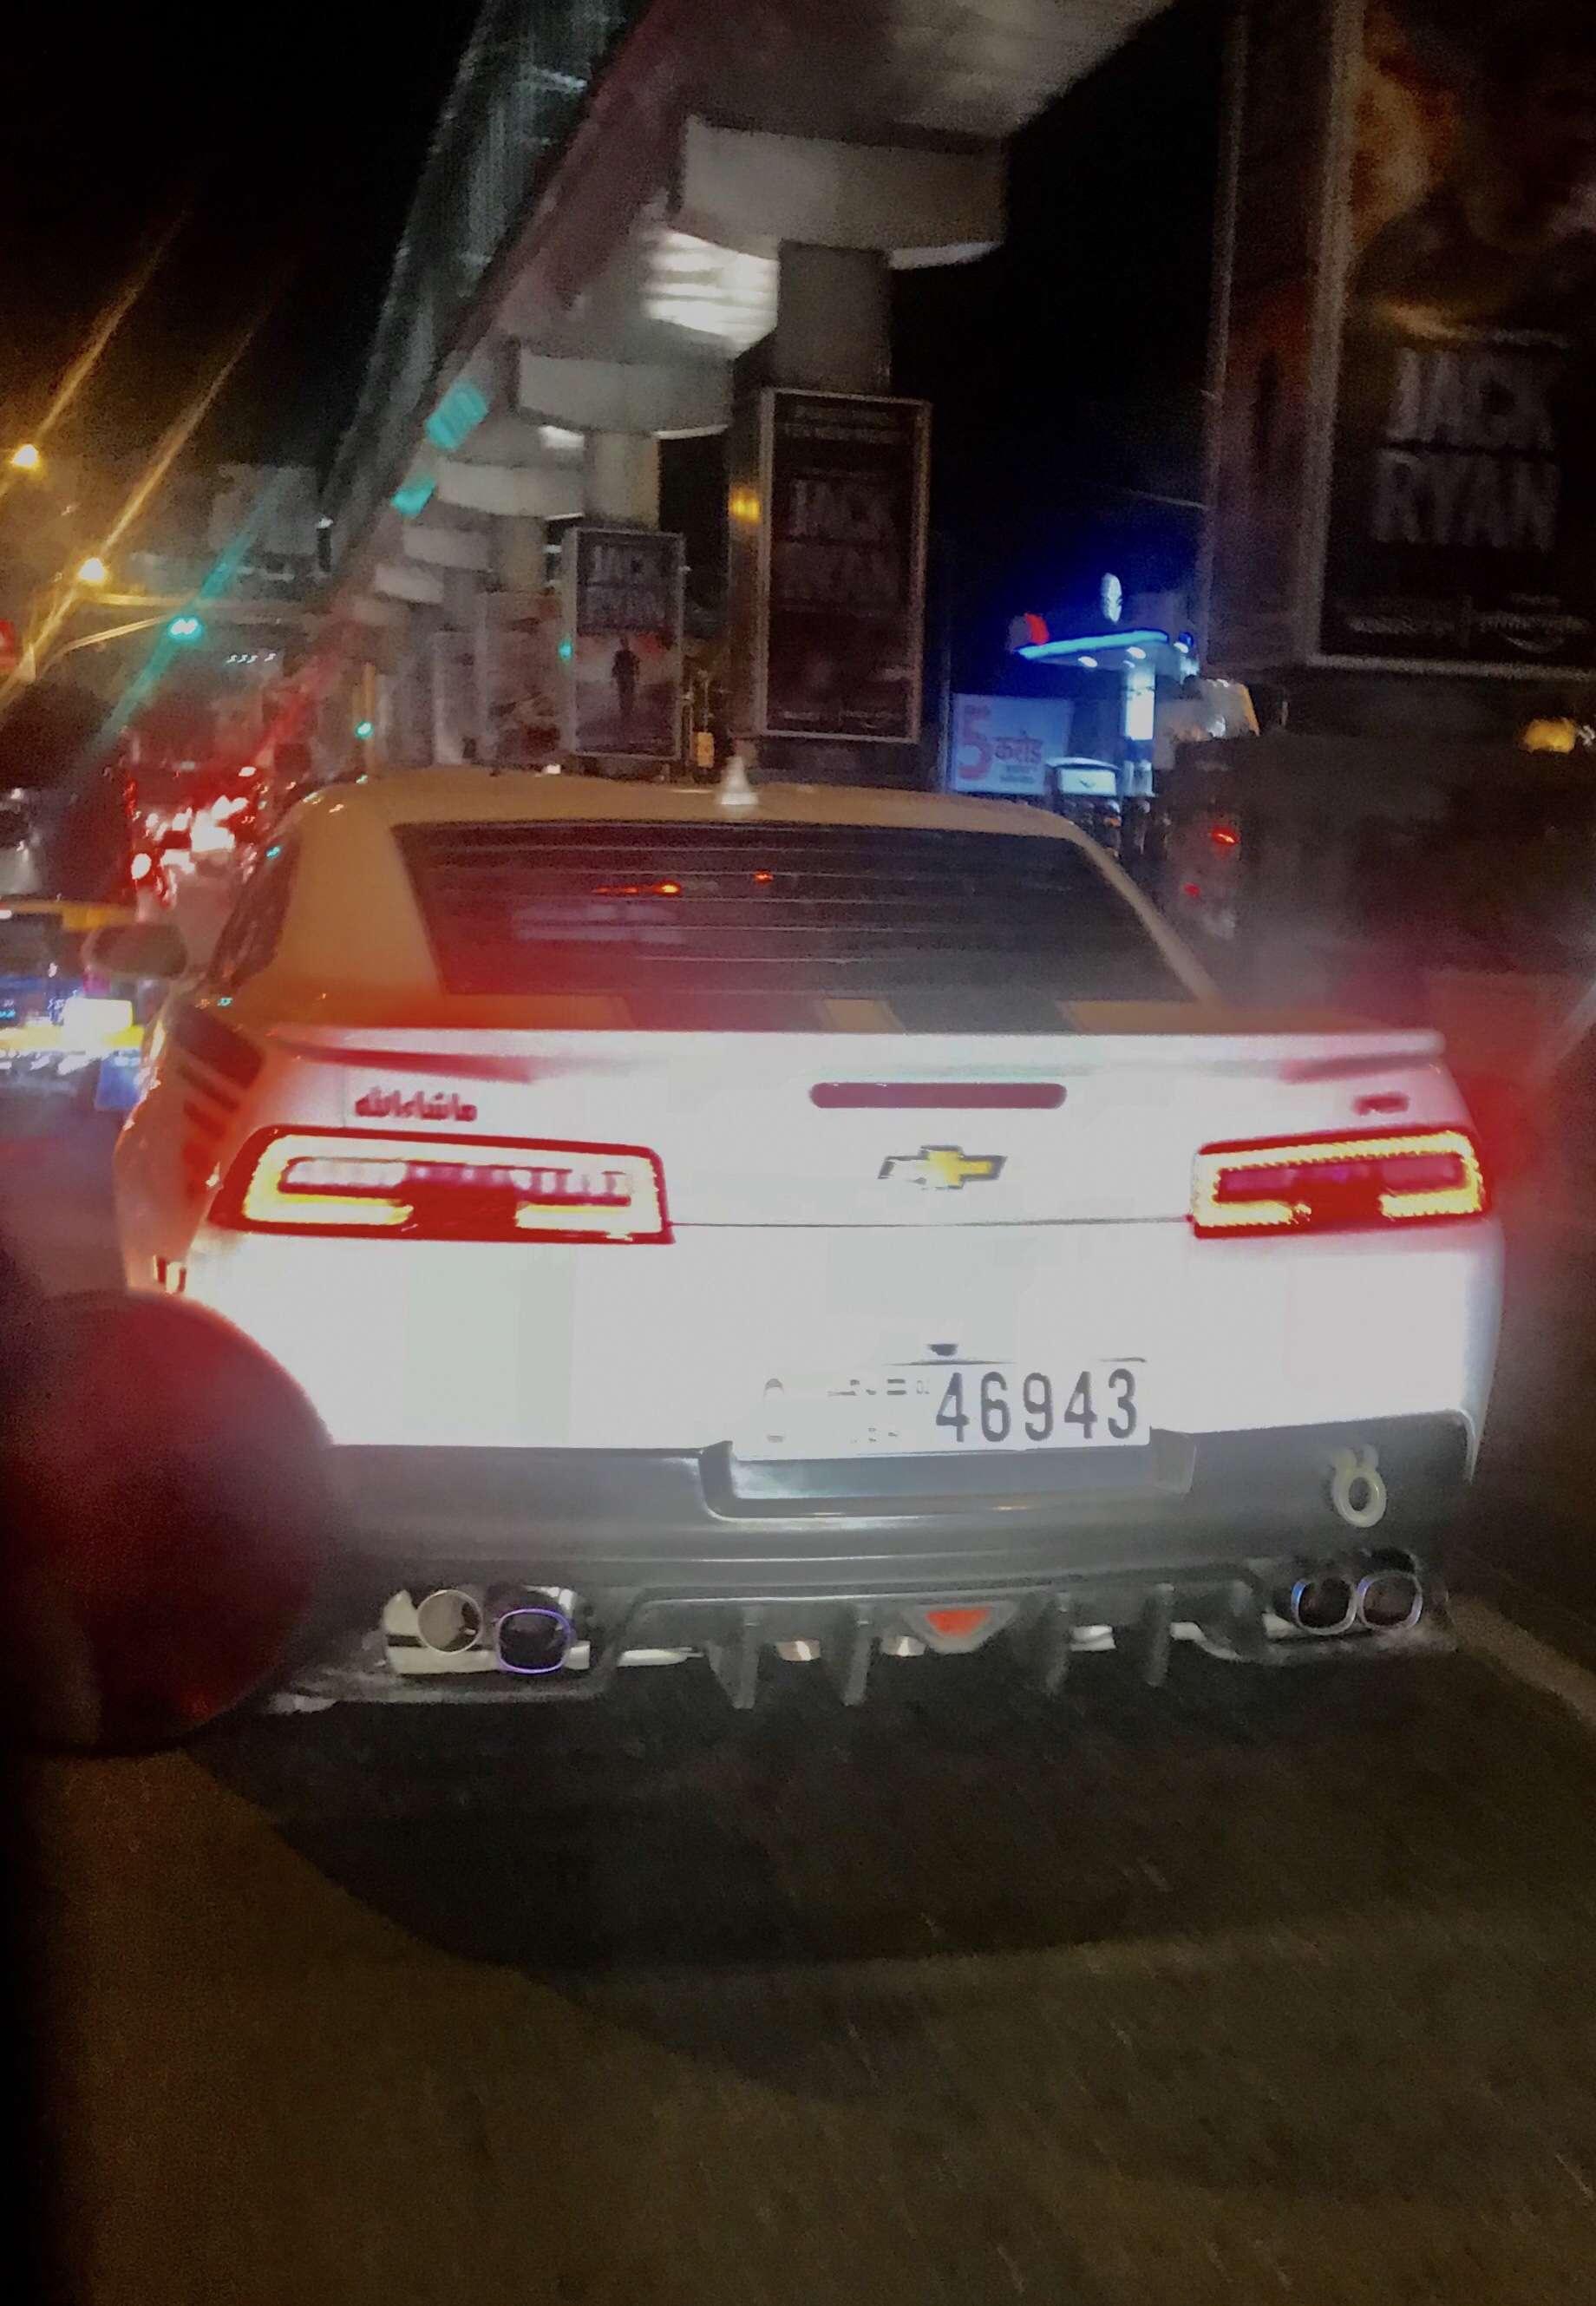 Traffic Crime Dubai Number Plate In Mumbai Times Of India